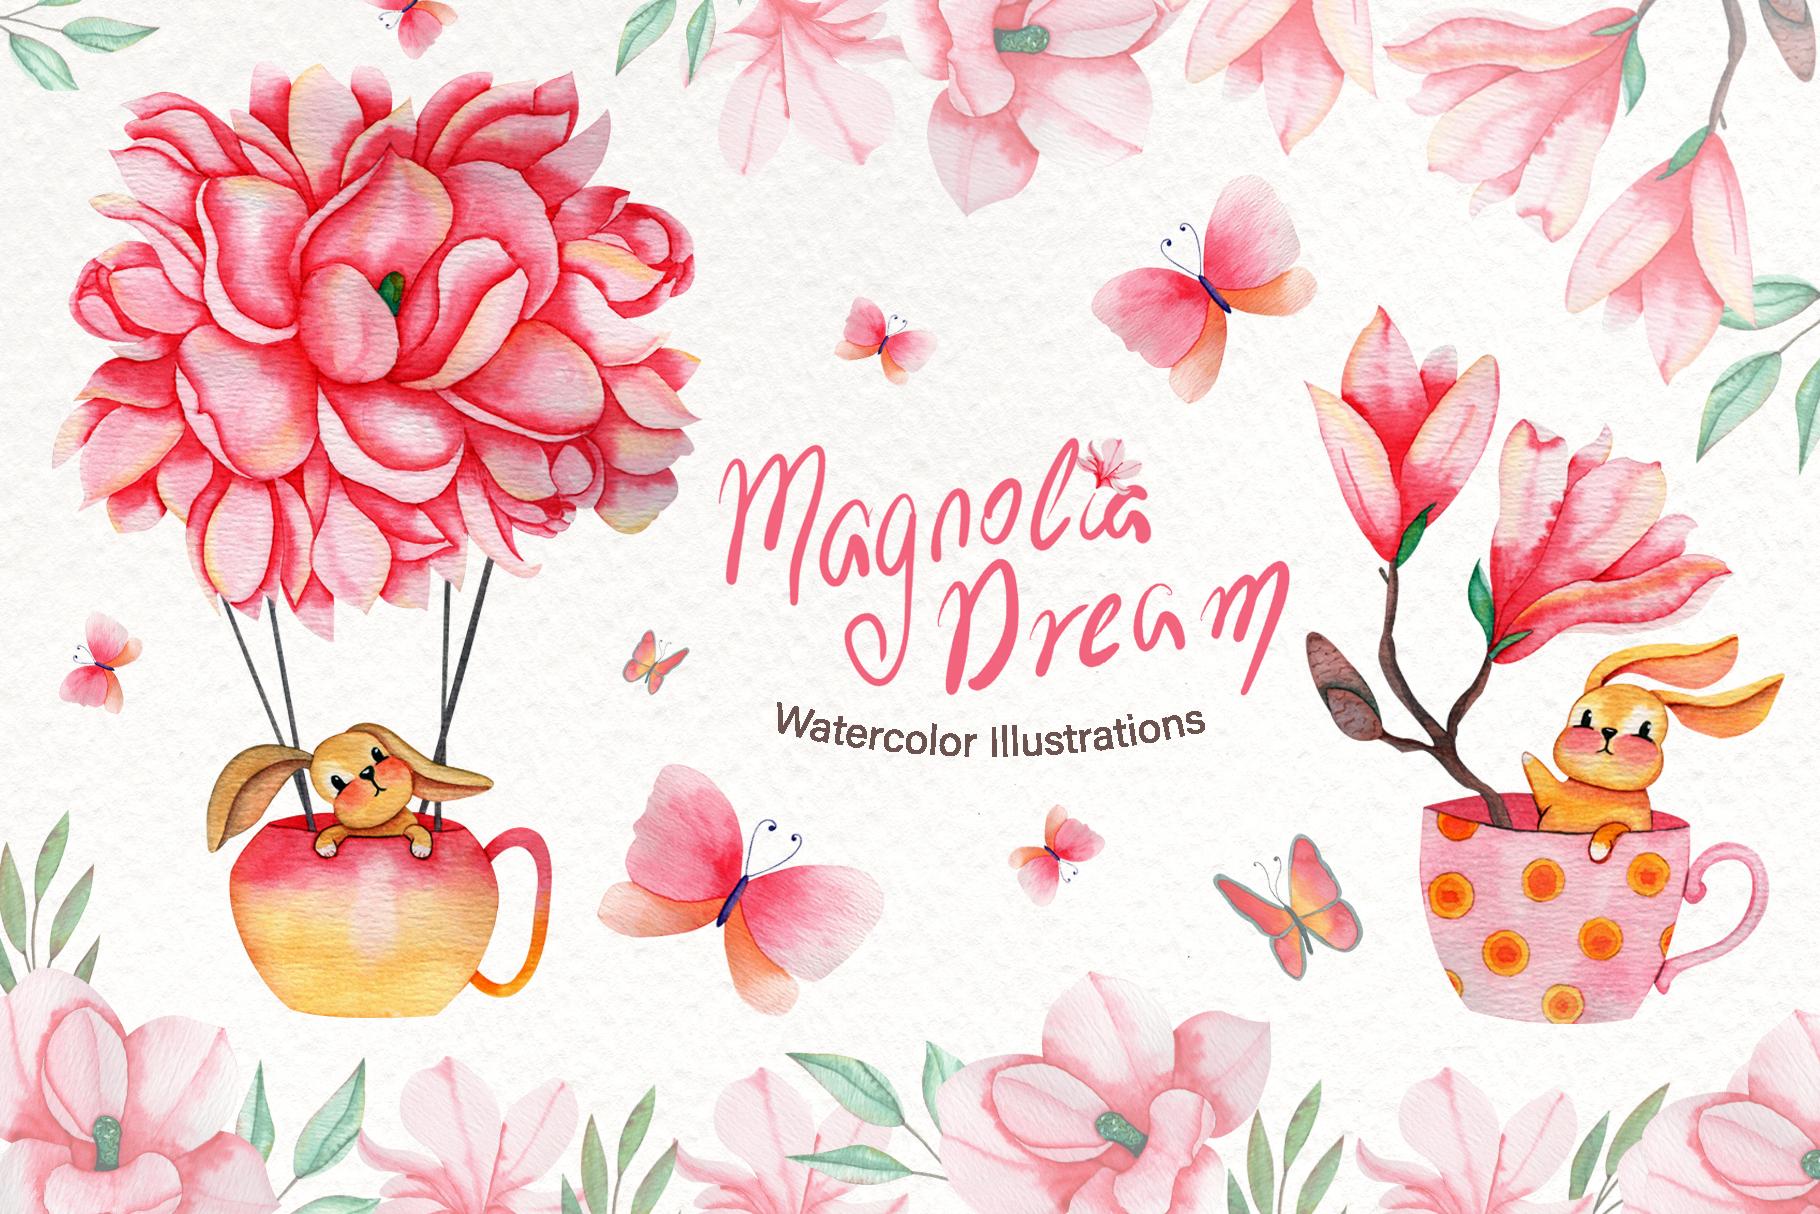 Magnolia Dream - Watercolor Illustrations example image 1